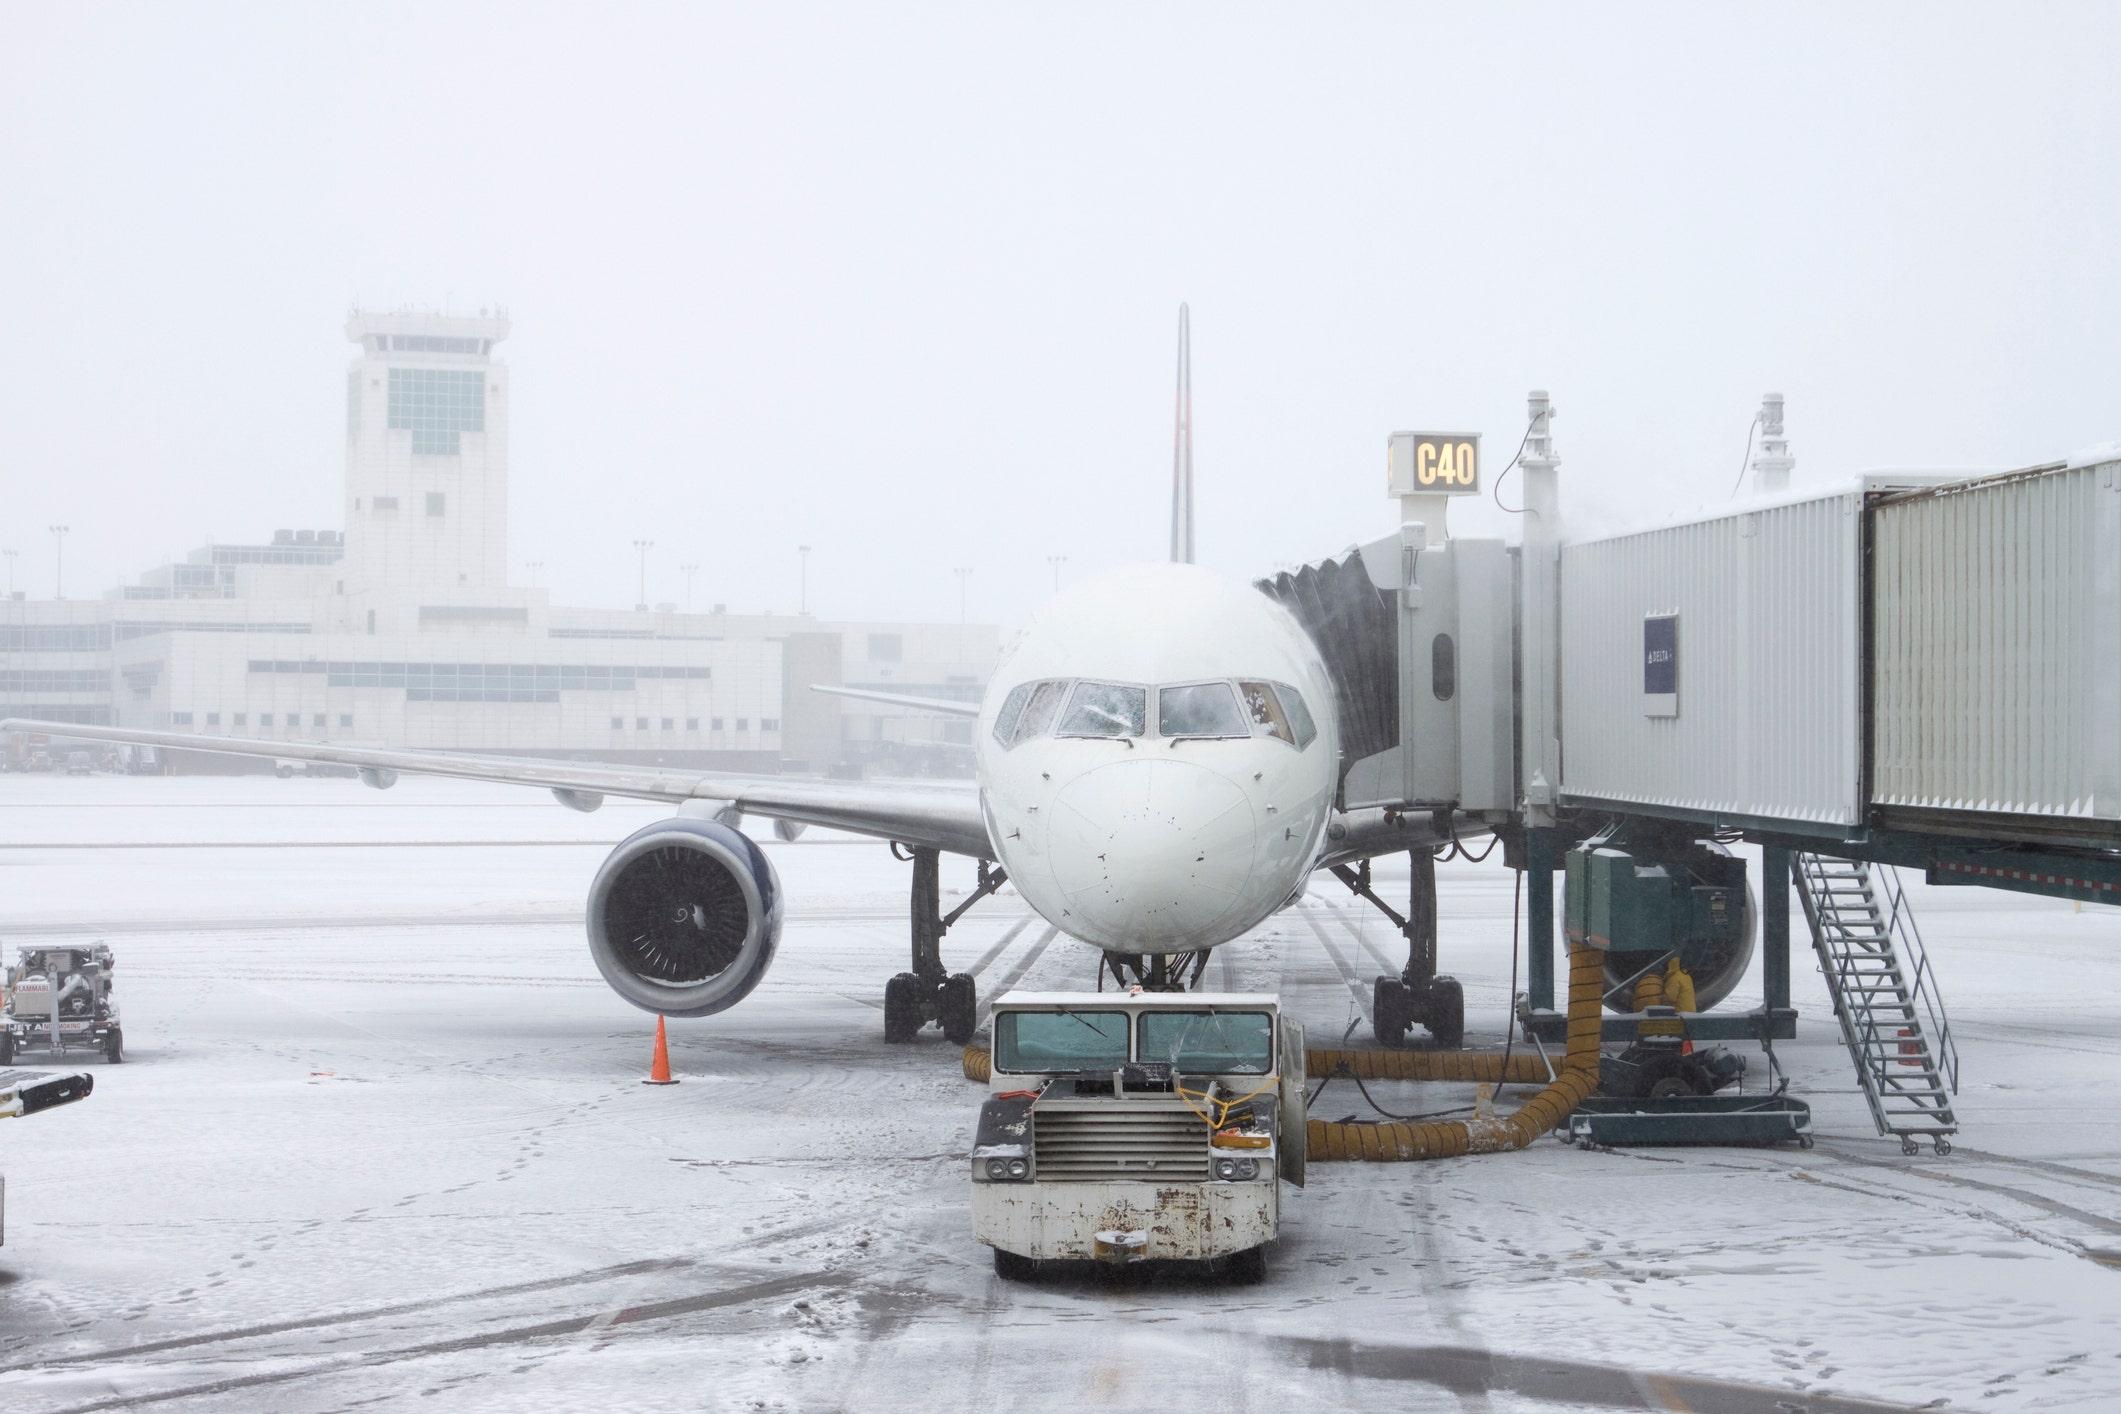 Winter to feature 'Polar Coaster' mix of frigid temperatures, snow: Farmers' Almanac